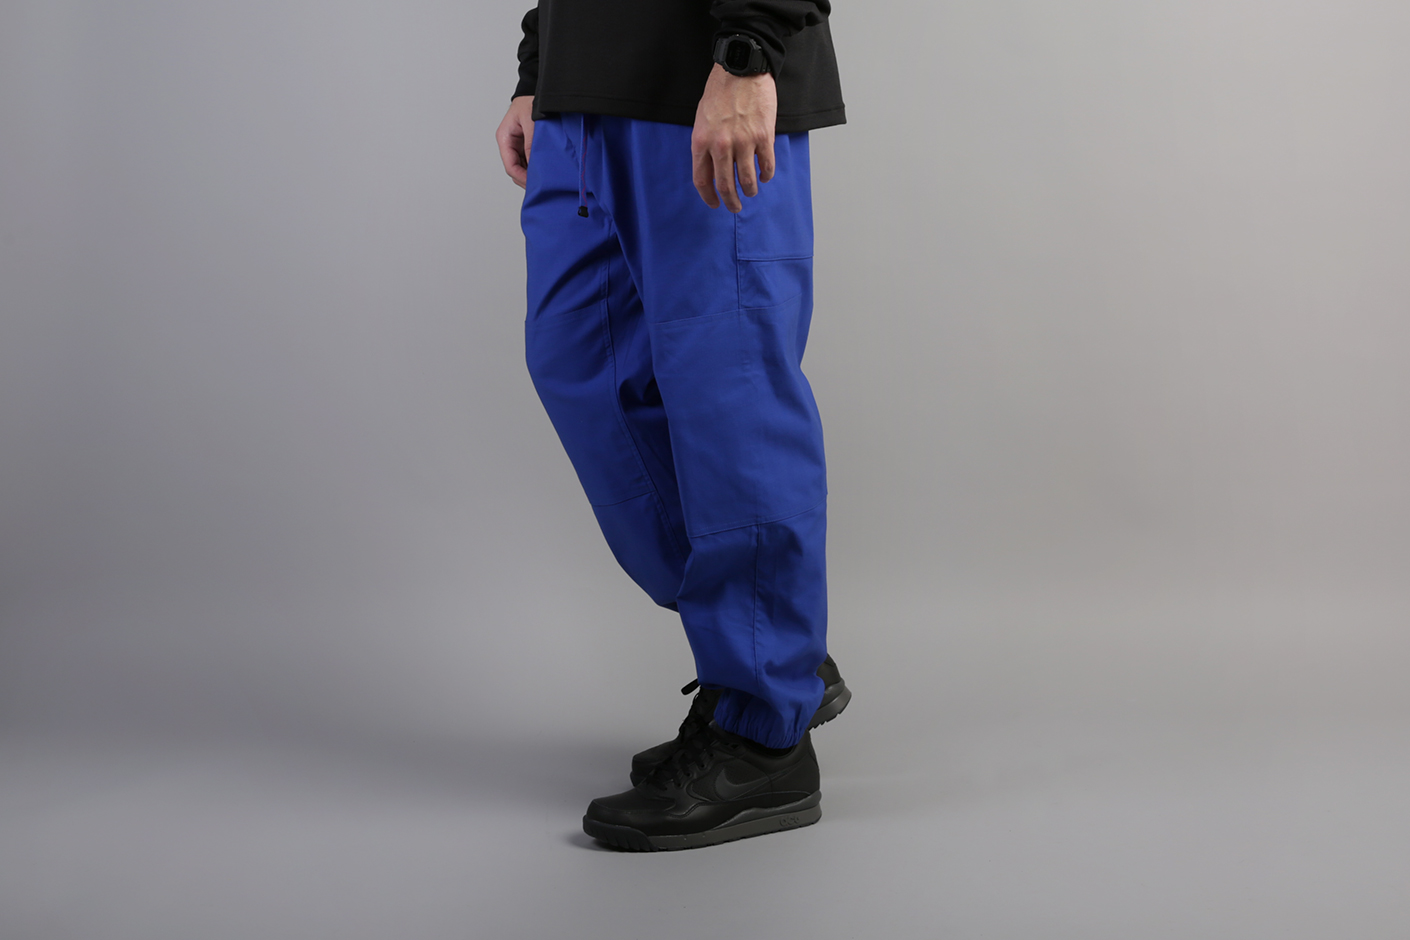 1f5598c8 Синяя одежда Nike (Найк) размера L - купить по цене от 2390 рублей в  интернет магазине Sneakerhead